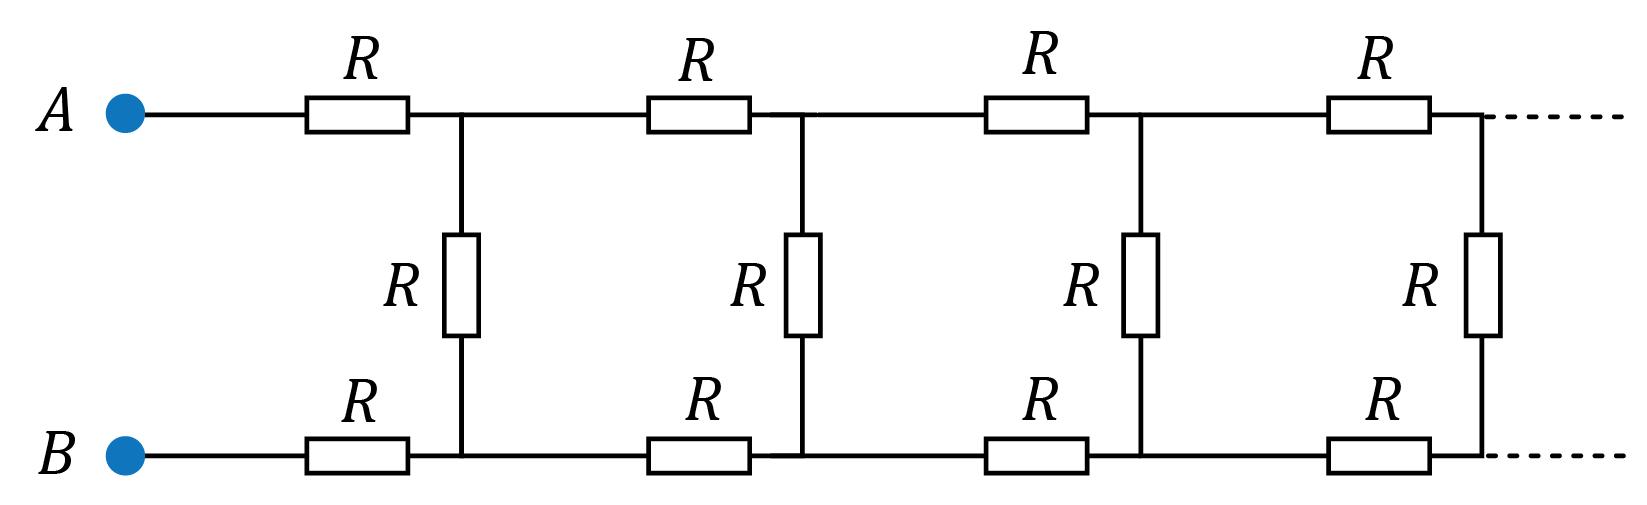 resinf